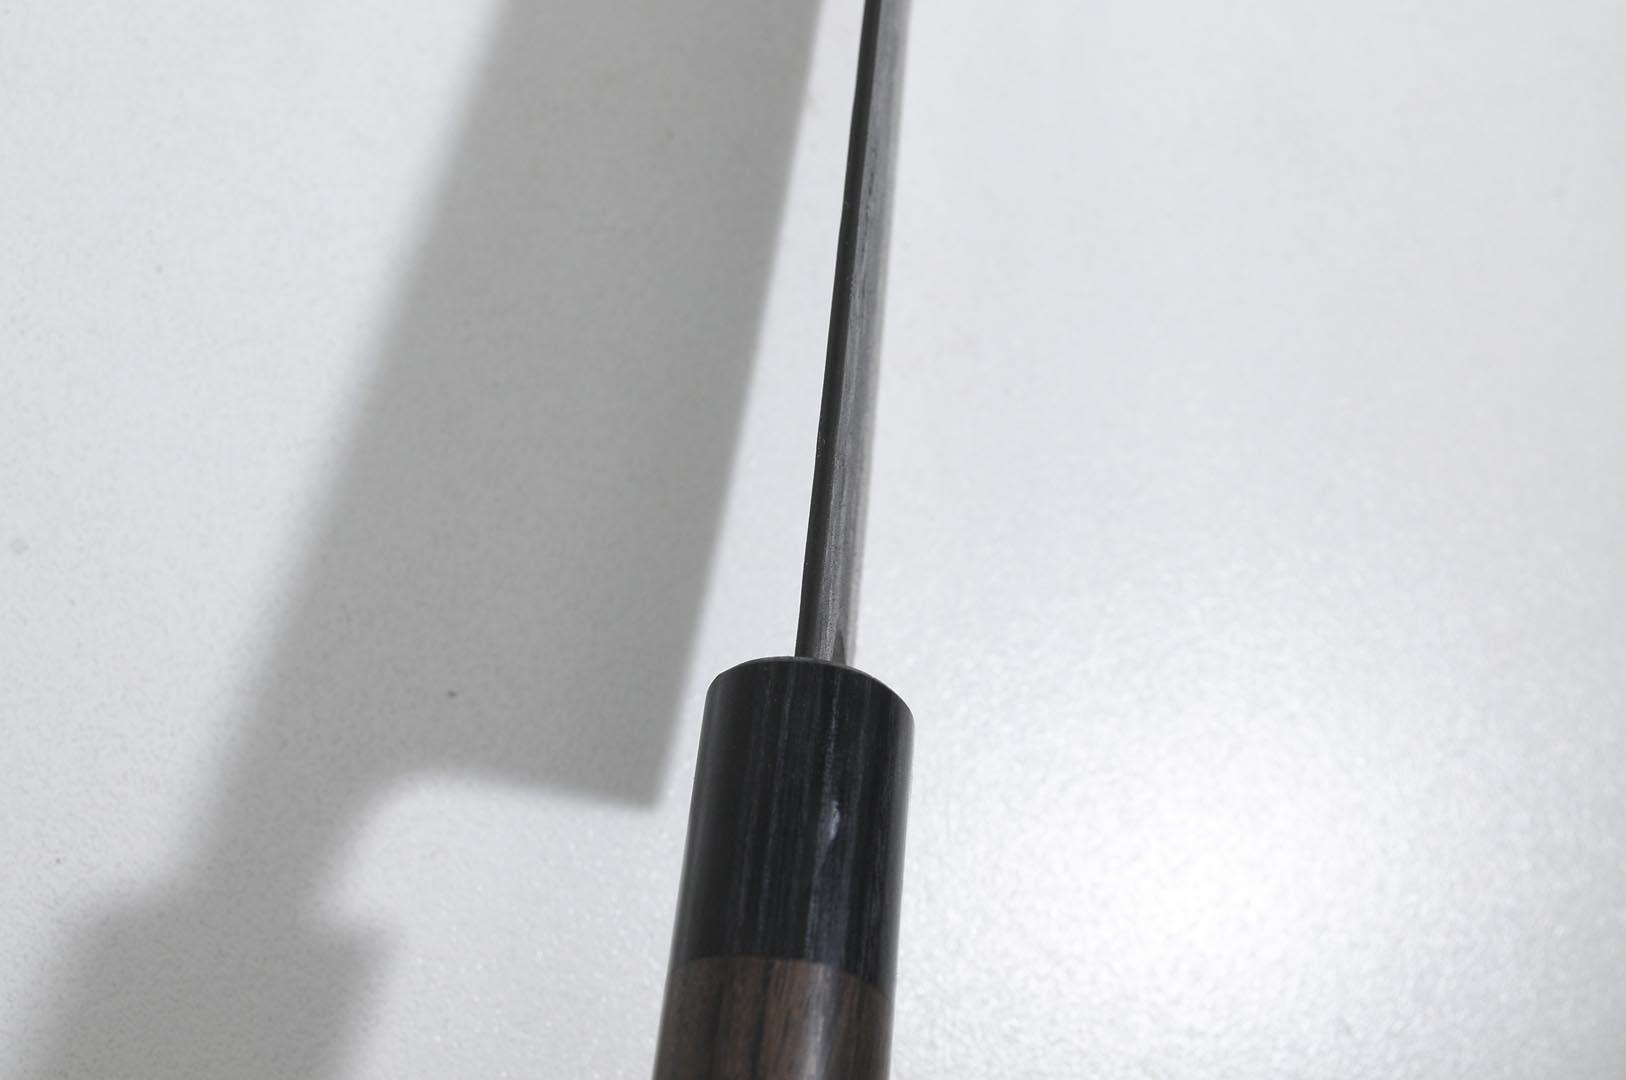 BS-16929-Cuchillo Gyuto 21cm Aogami Blue Super+clad inox Kurouchi BS-16929-max-3.